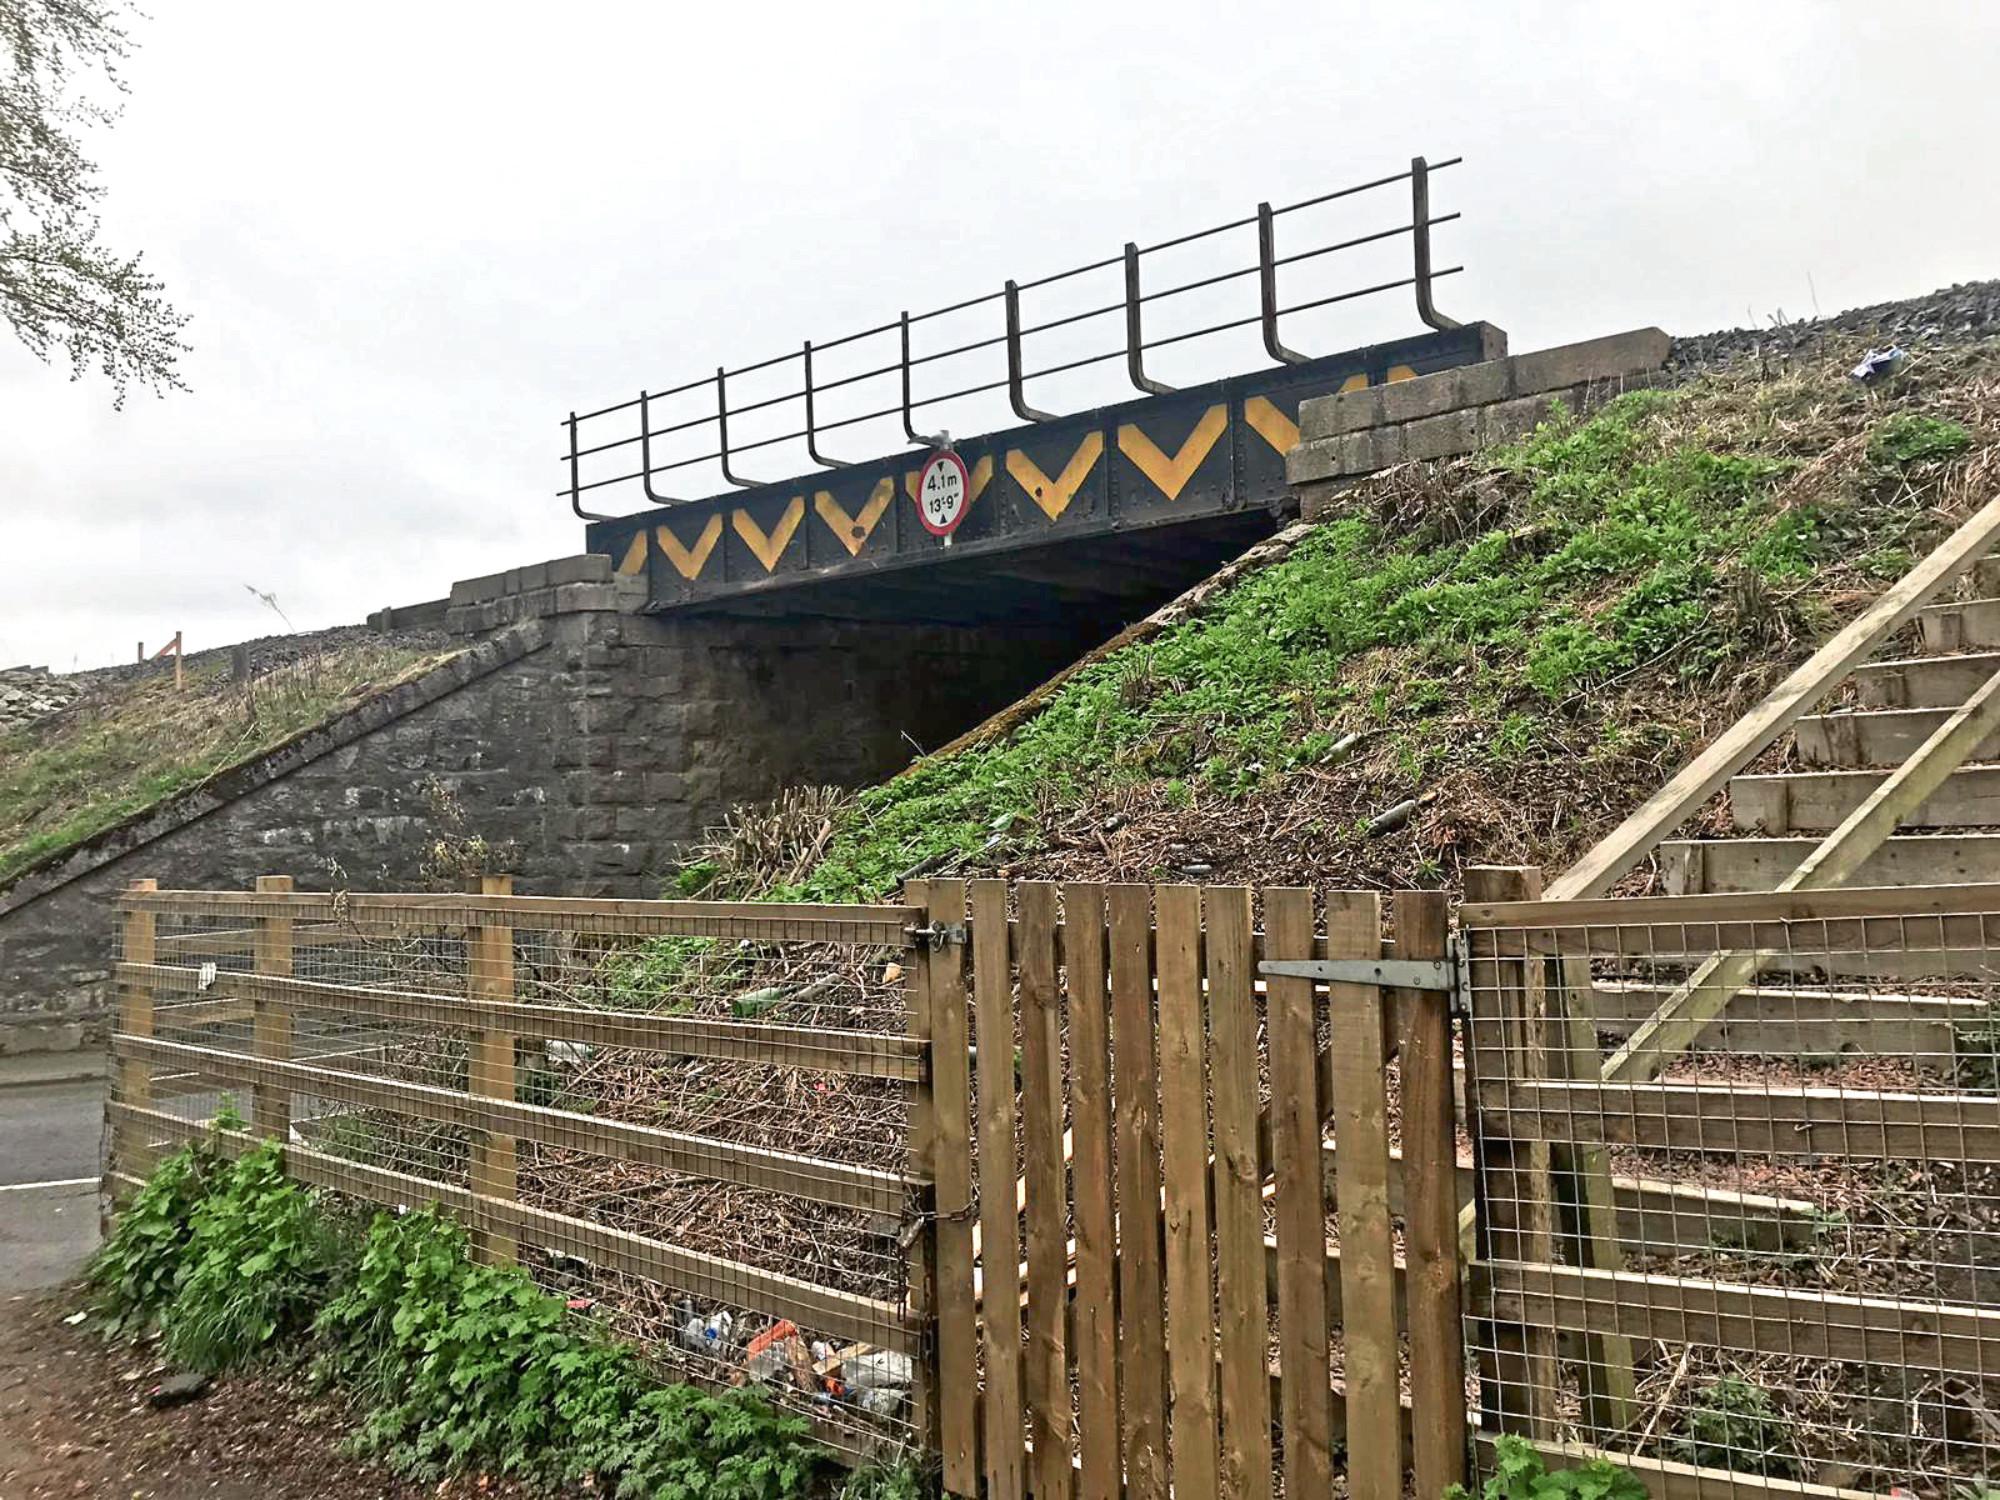 The railway bridge on Keithhall Road